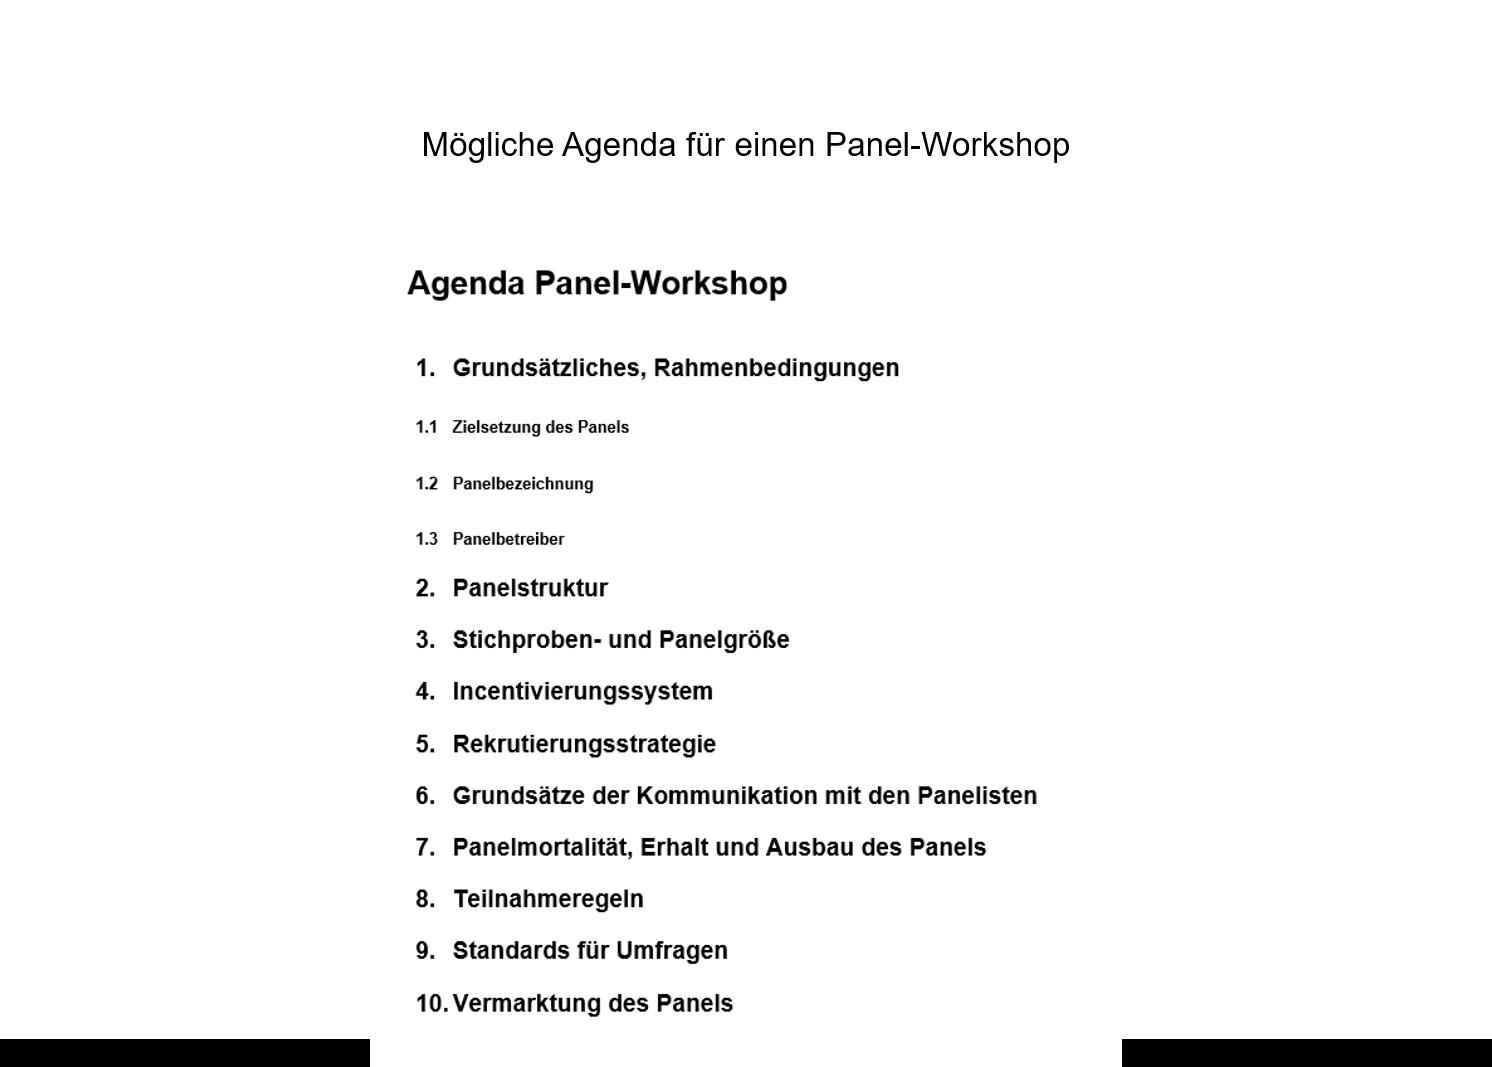 Panelaufbau Agenda Panel-Workshop